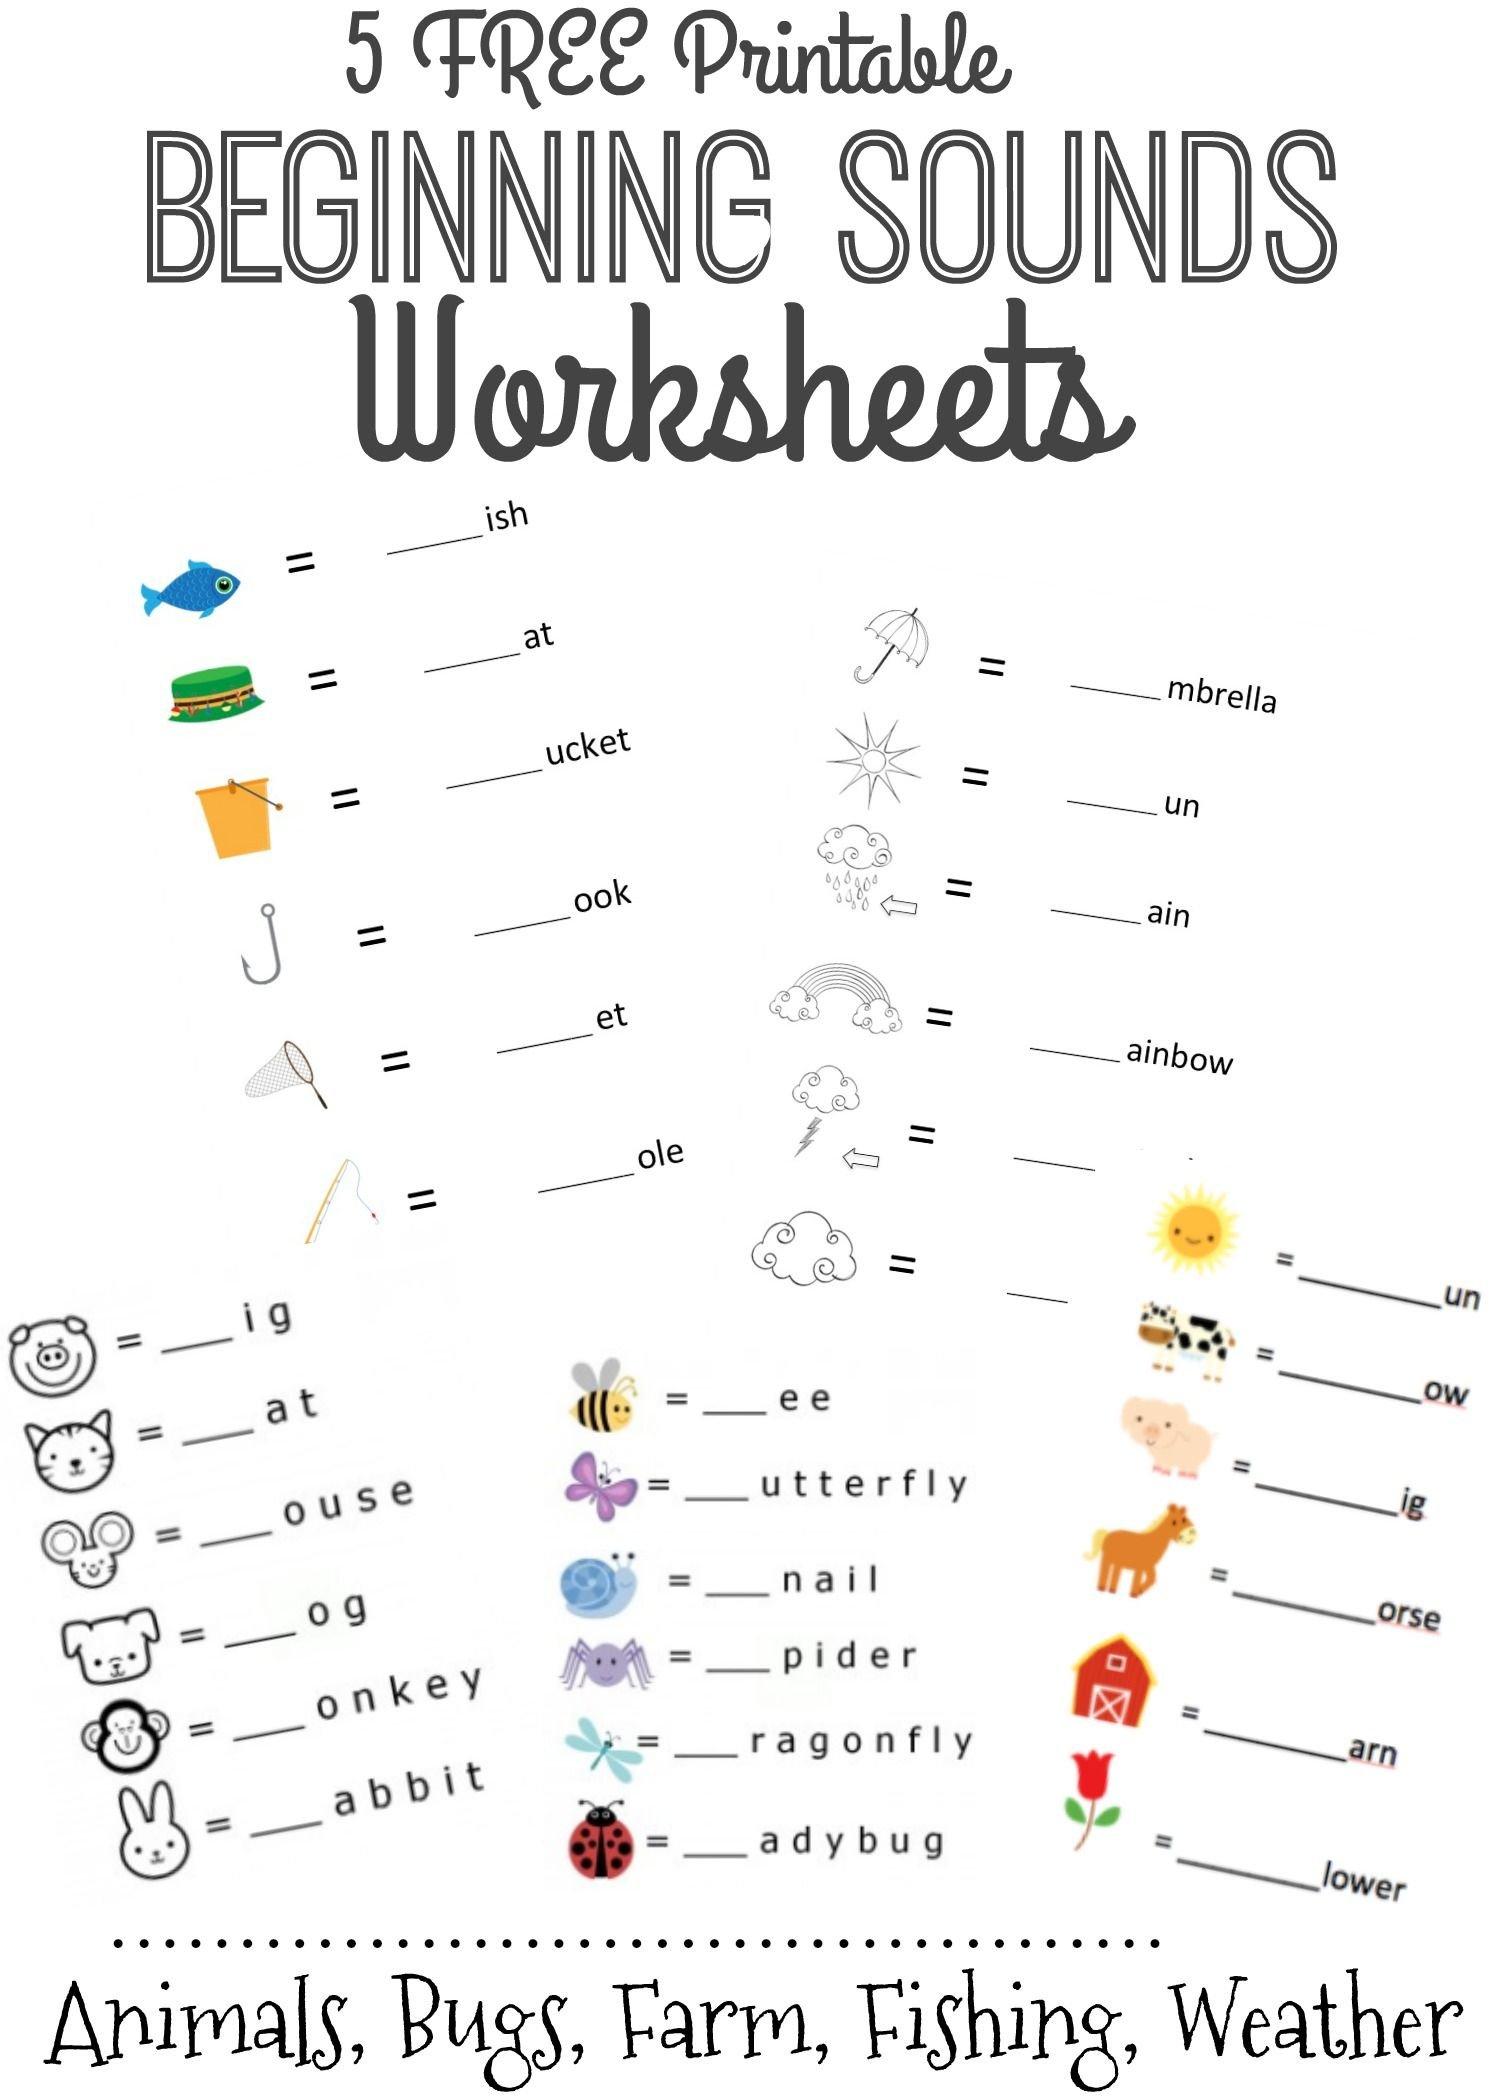 Kindergarten Thanksgiving Crafts To Make Teaching Music Within Music Worksheets For Kindergarten